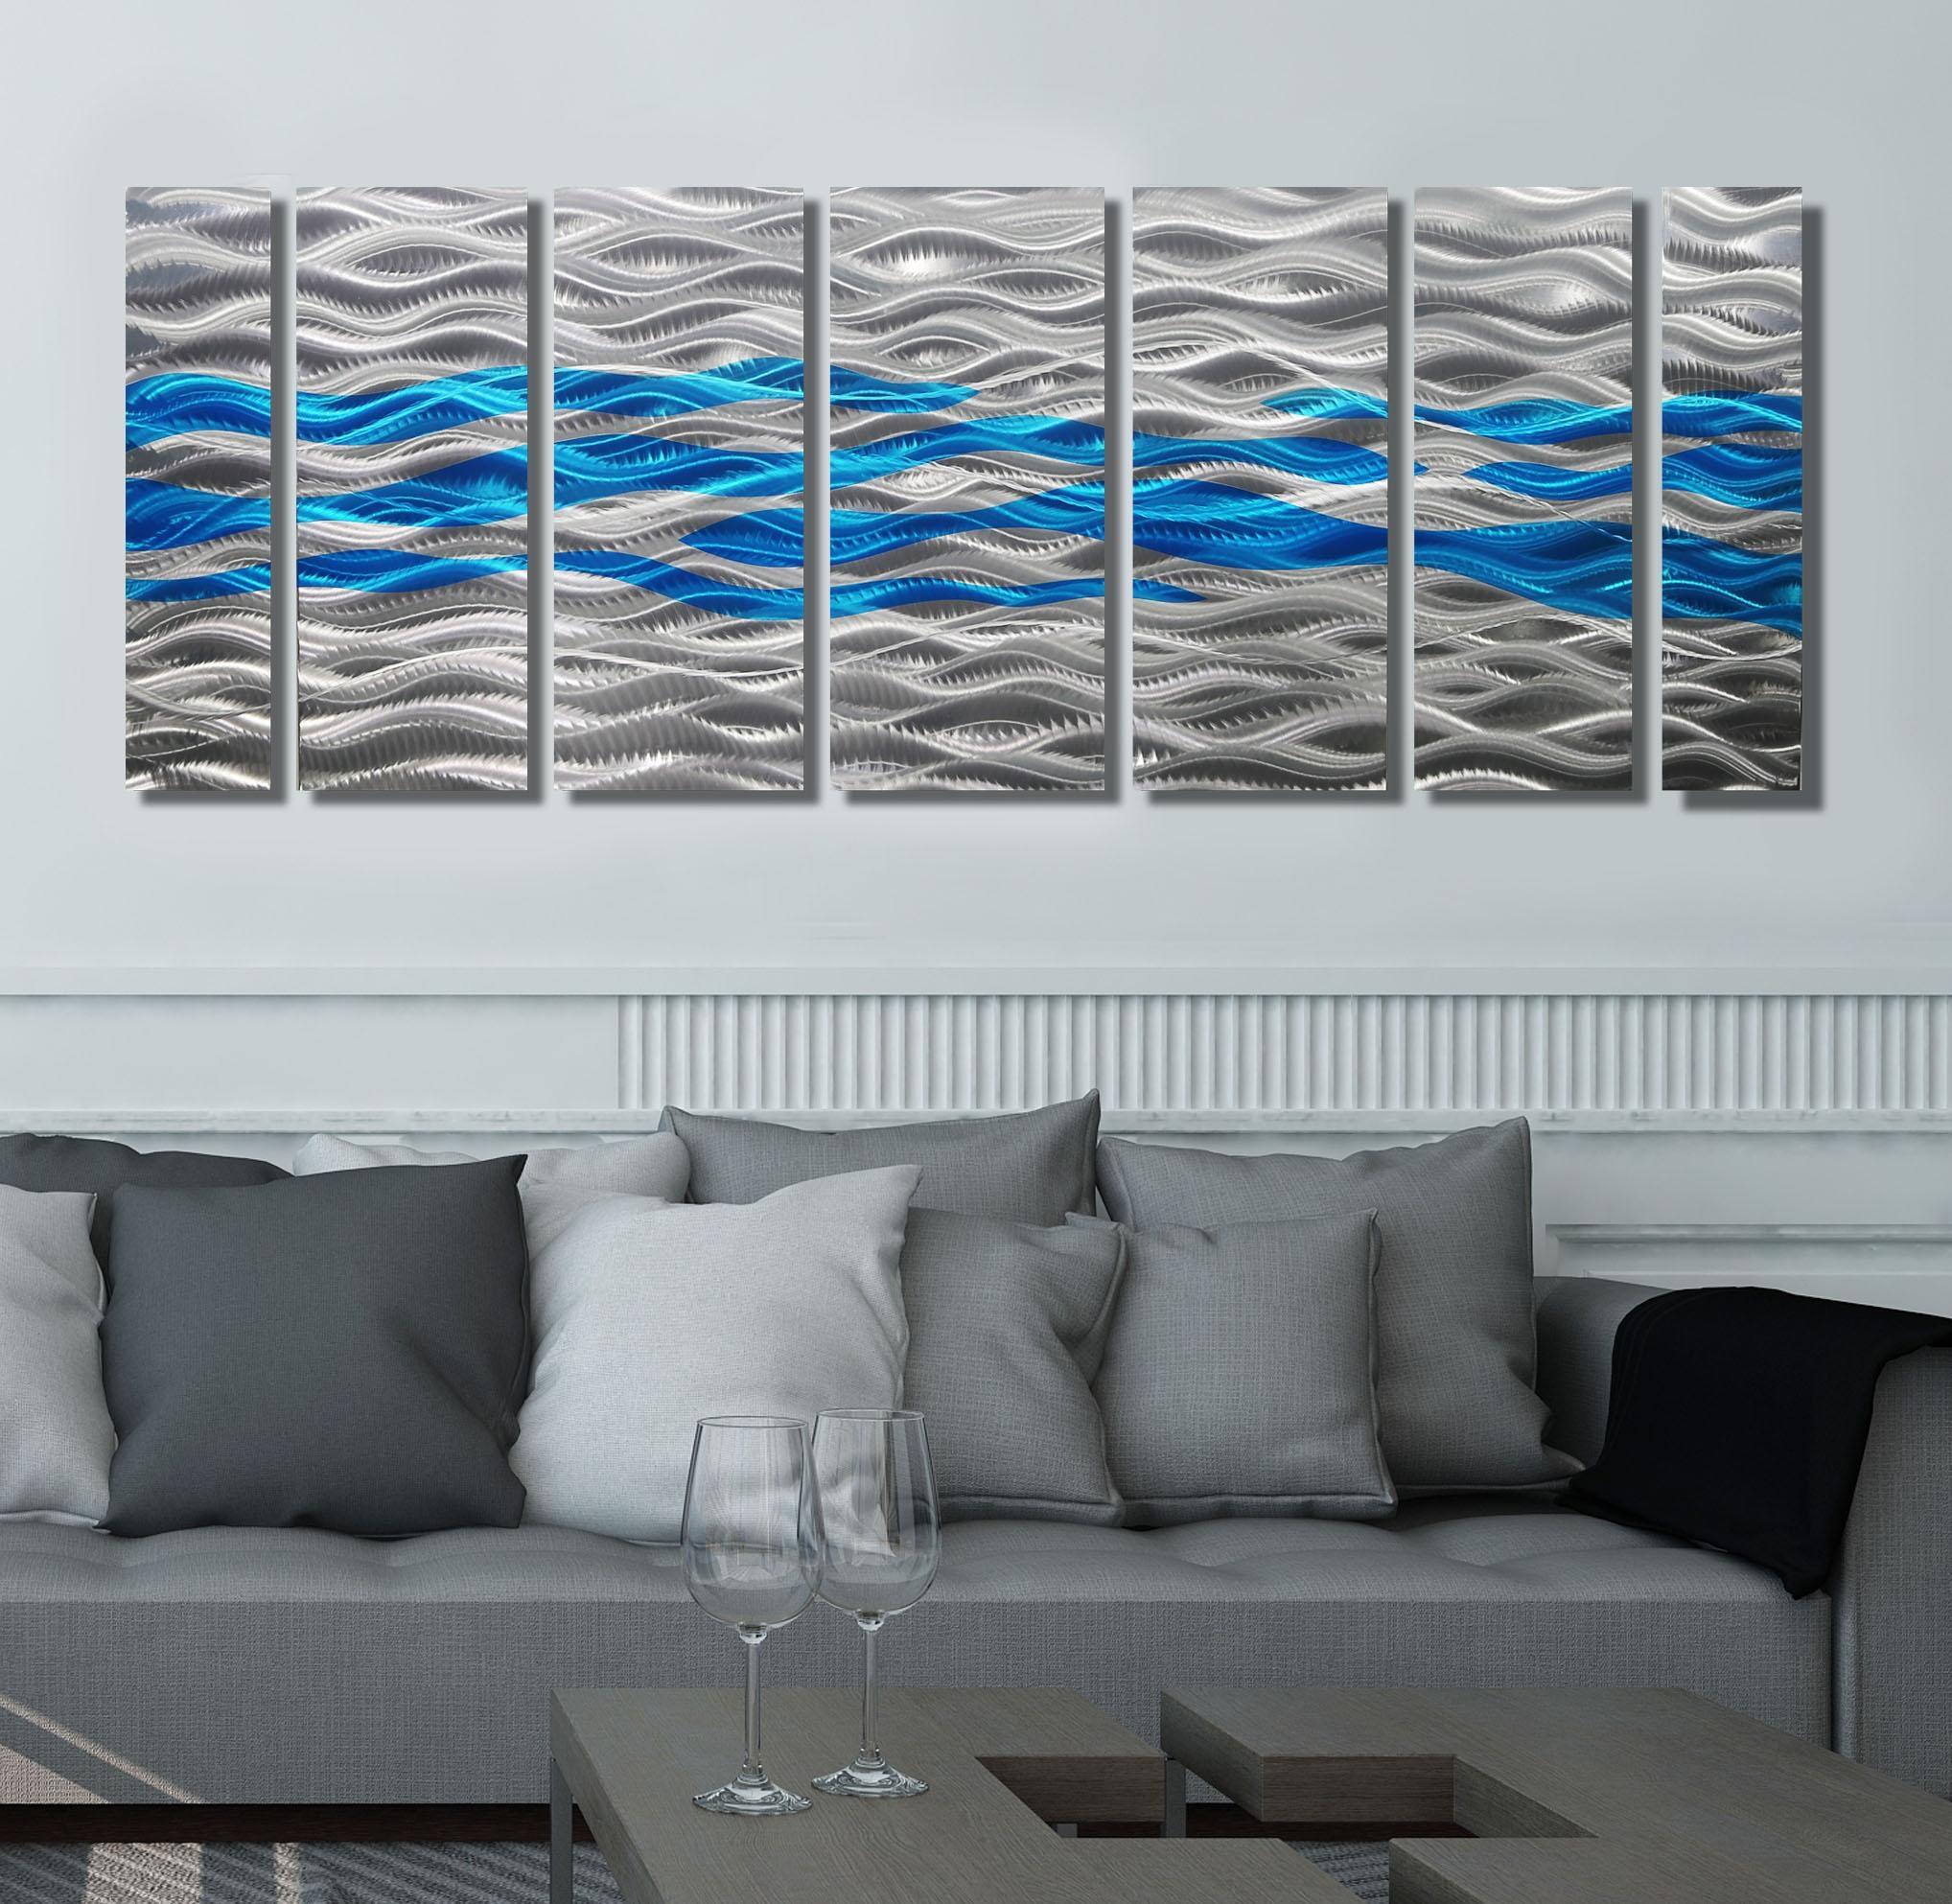 Caliente Aqua – Silver & Aqua Blue Abstract Metal Wall Artjon Pertaining To Blue And Silver Wall Art (Image 9 of 20)